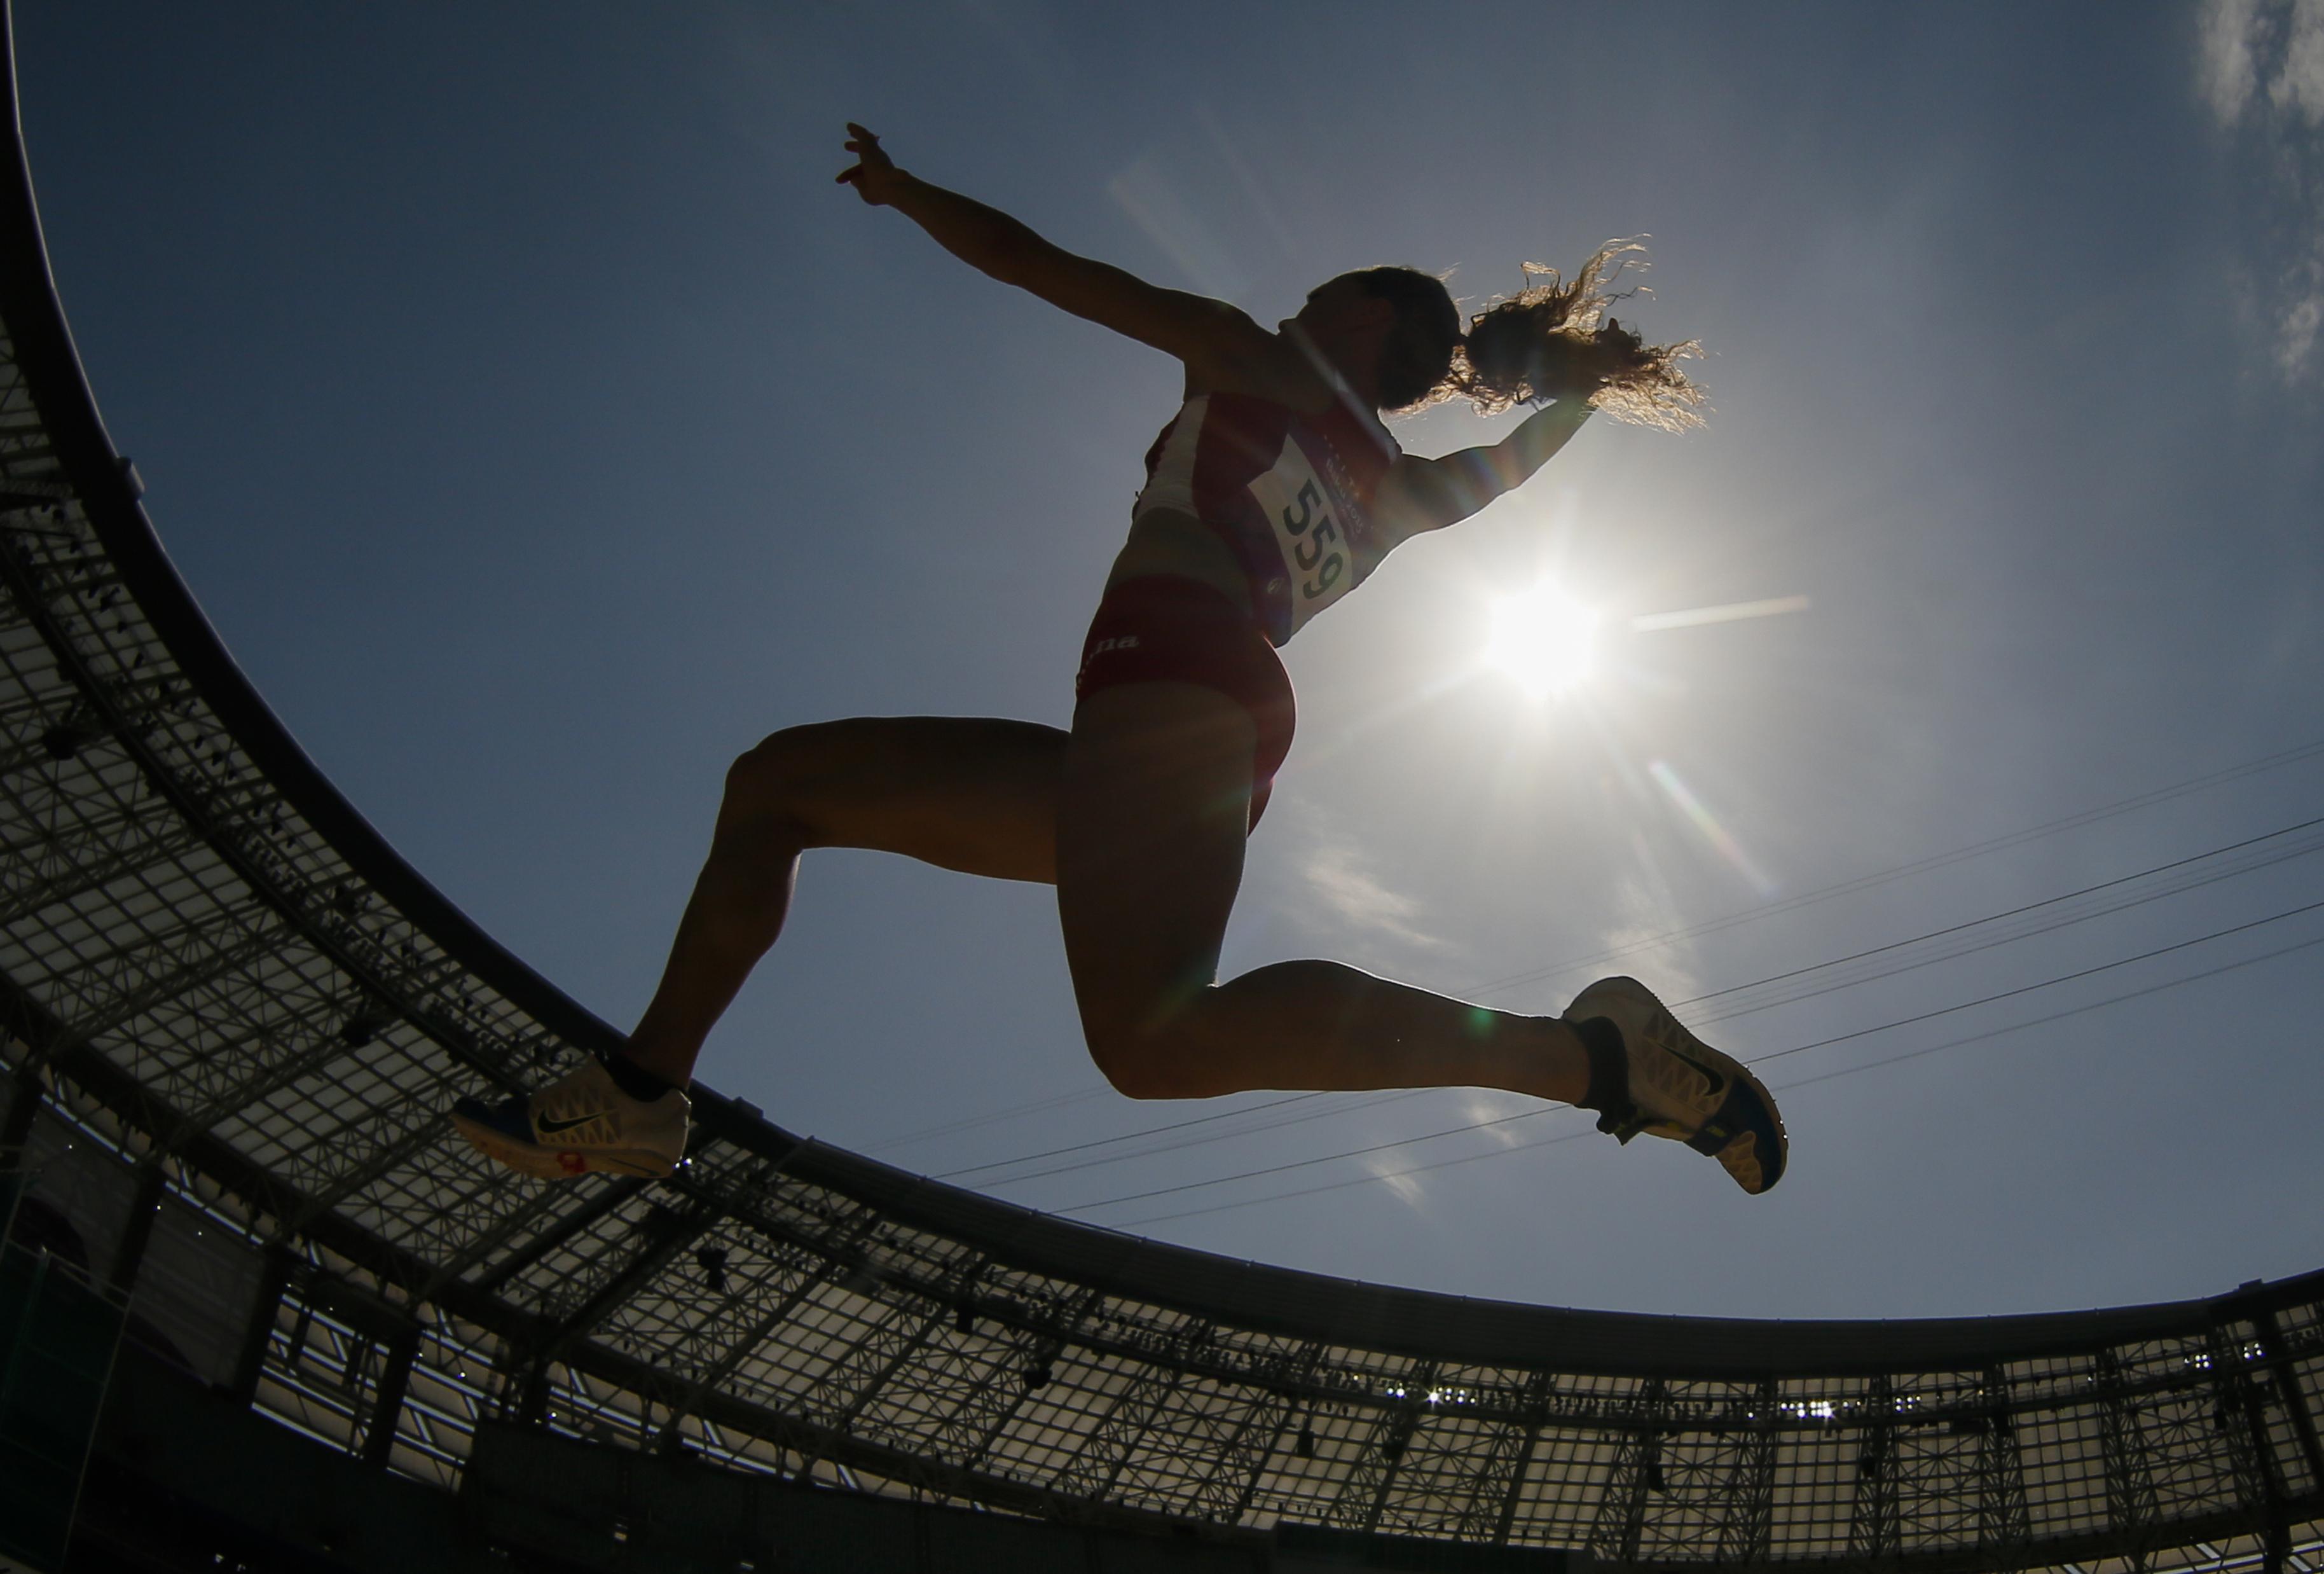 Rebecca Camilleri of Malta competes during the women's long jump event at the 2015 European Games in Baku, Azerbaijan, Monday, June 22, 2015. (AP Photo/Dmitry Lovetsky)